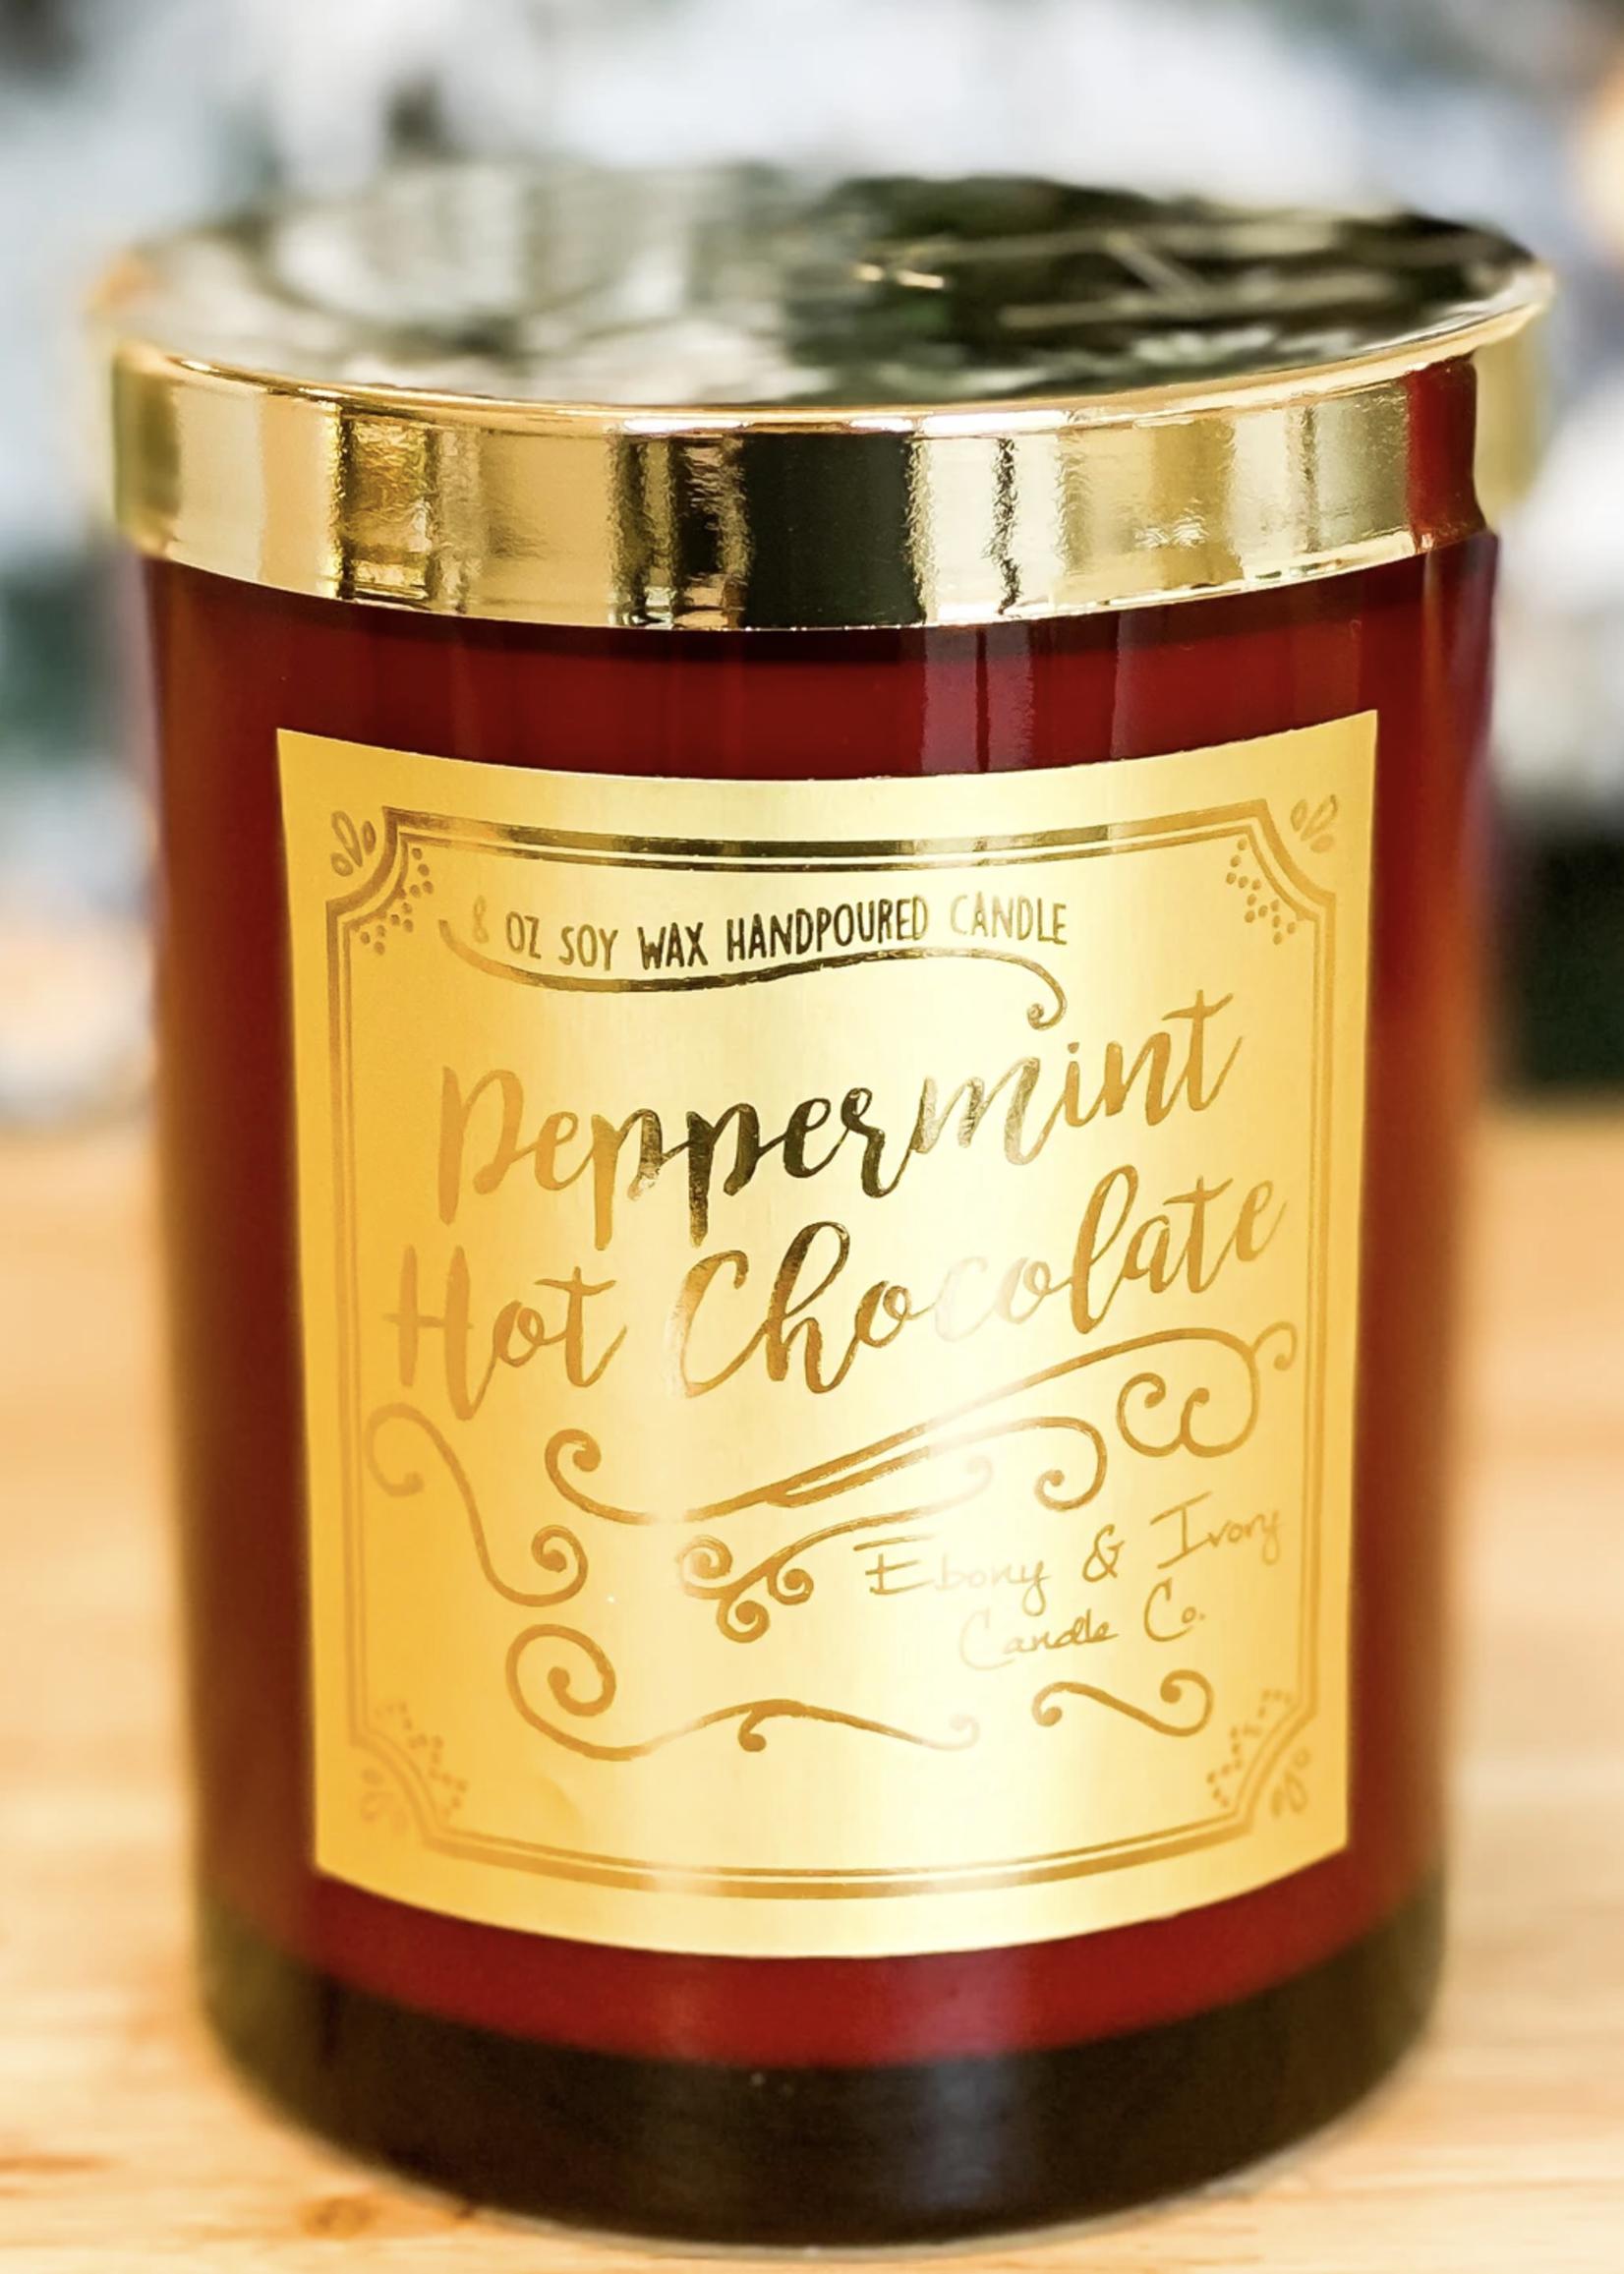 Ebony & Ivory Candle Co. Peppermint Hot Chocolate Candle 8oz